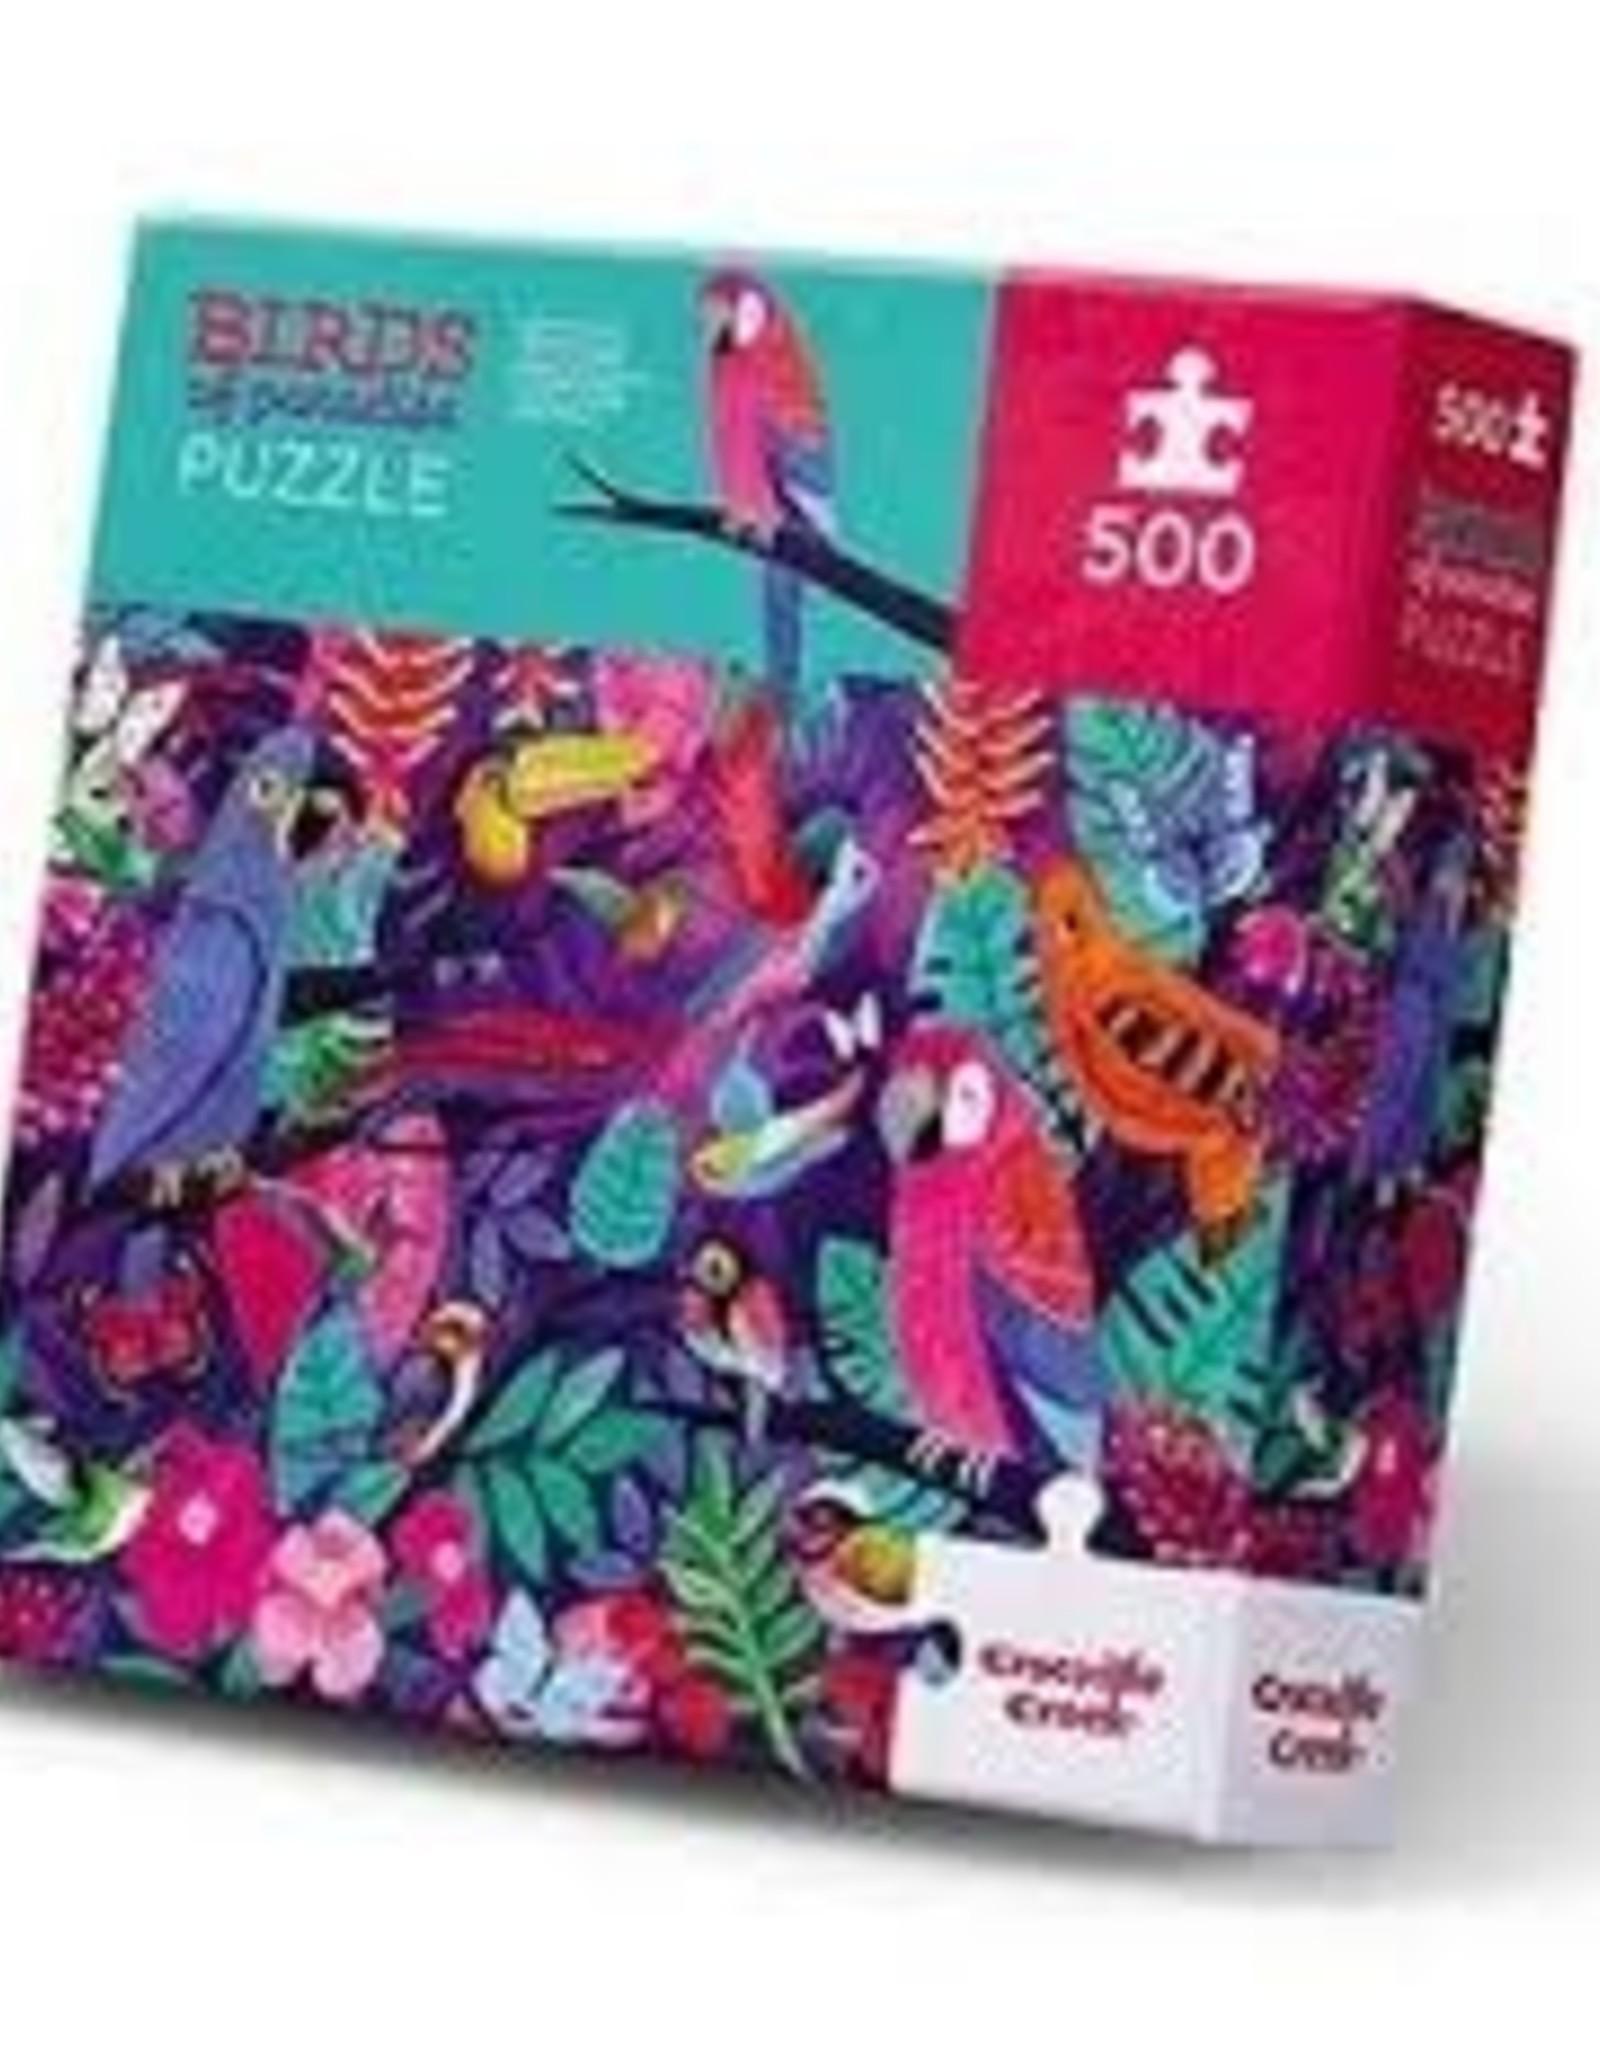 Crocodile Creek Crocodile Creek - Birds of Paradice Puzzle 500 pc